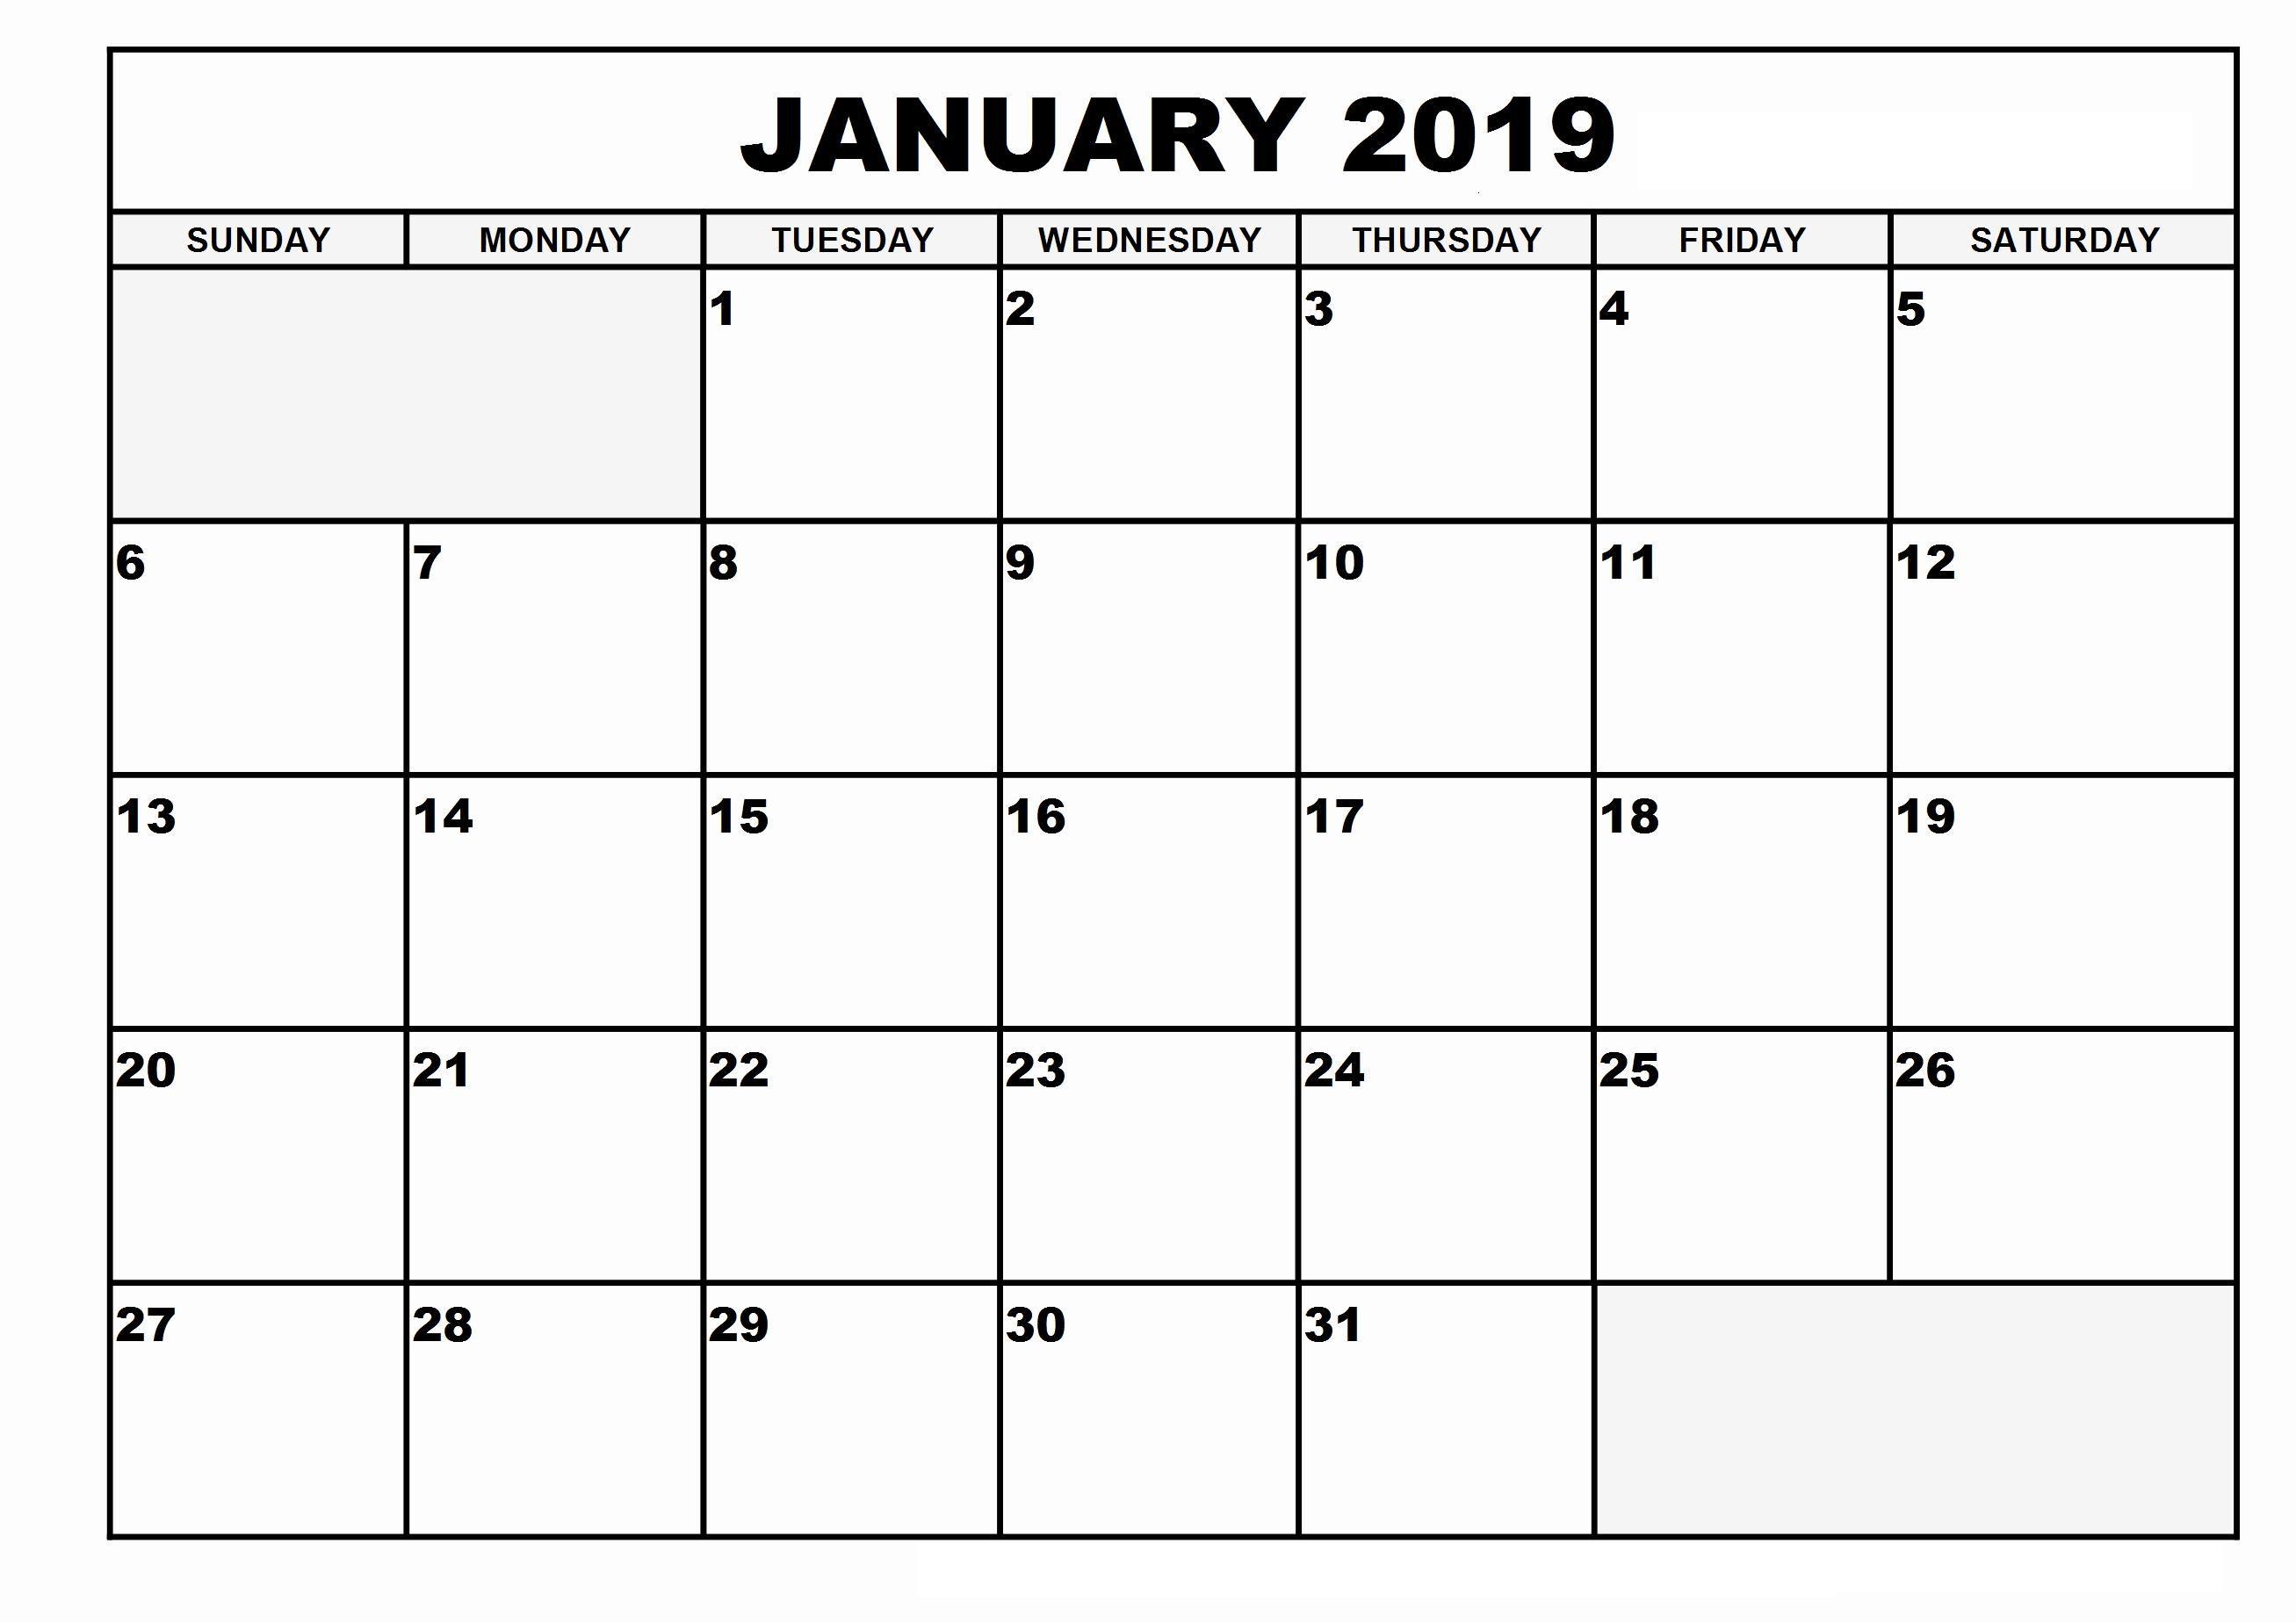 January 2019 Calendar Template Dates